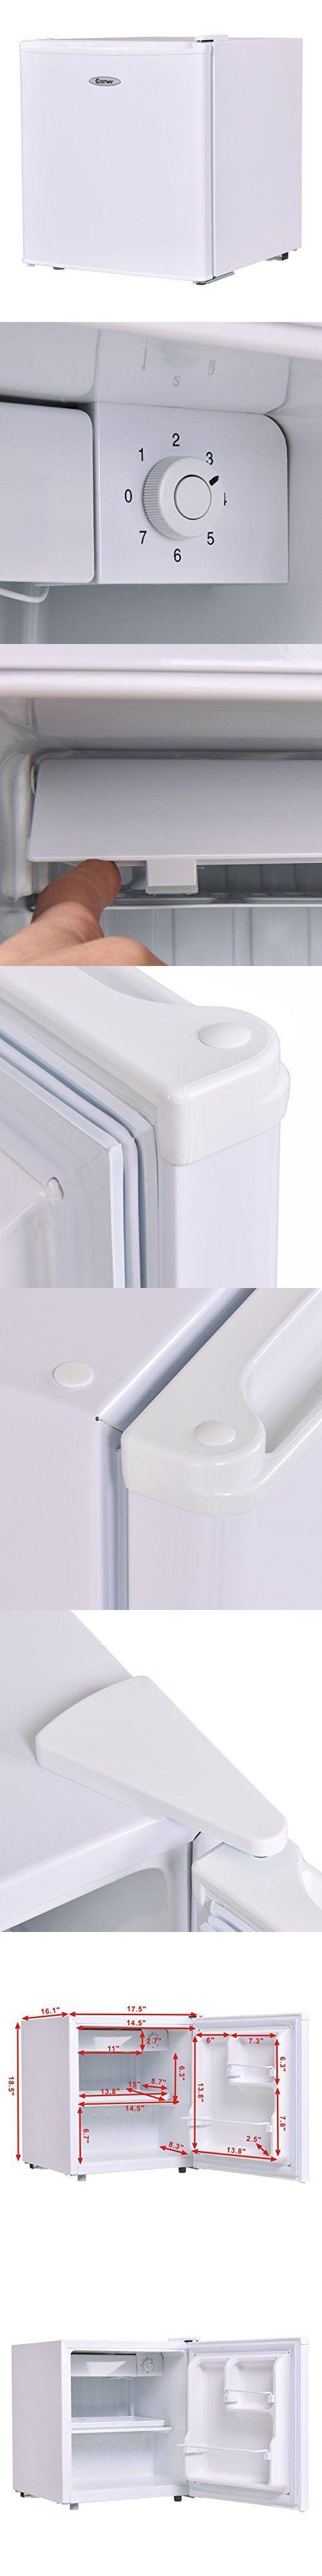 summerset download refrigerator grills drawer single ssdr